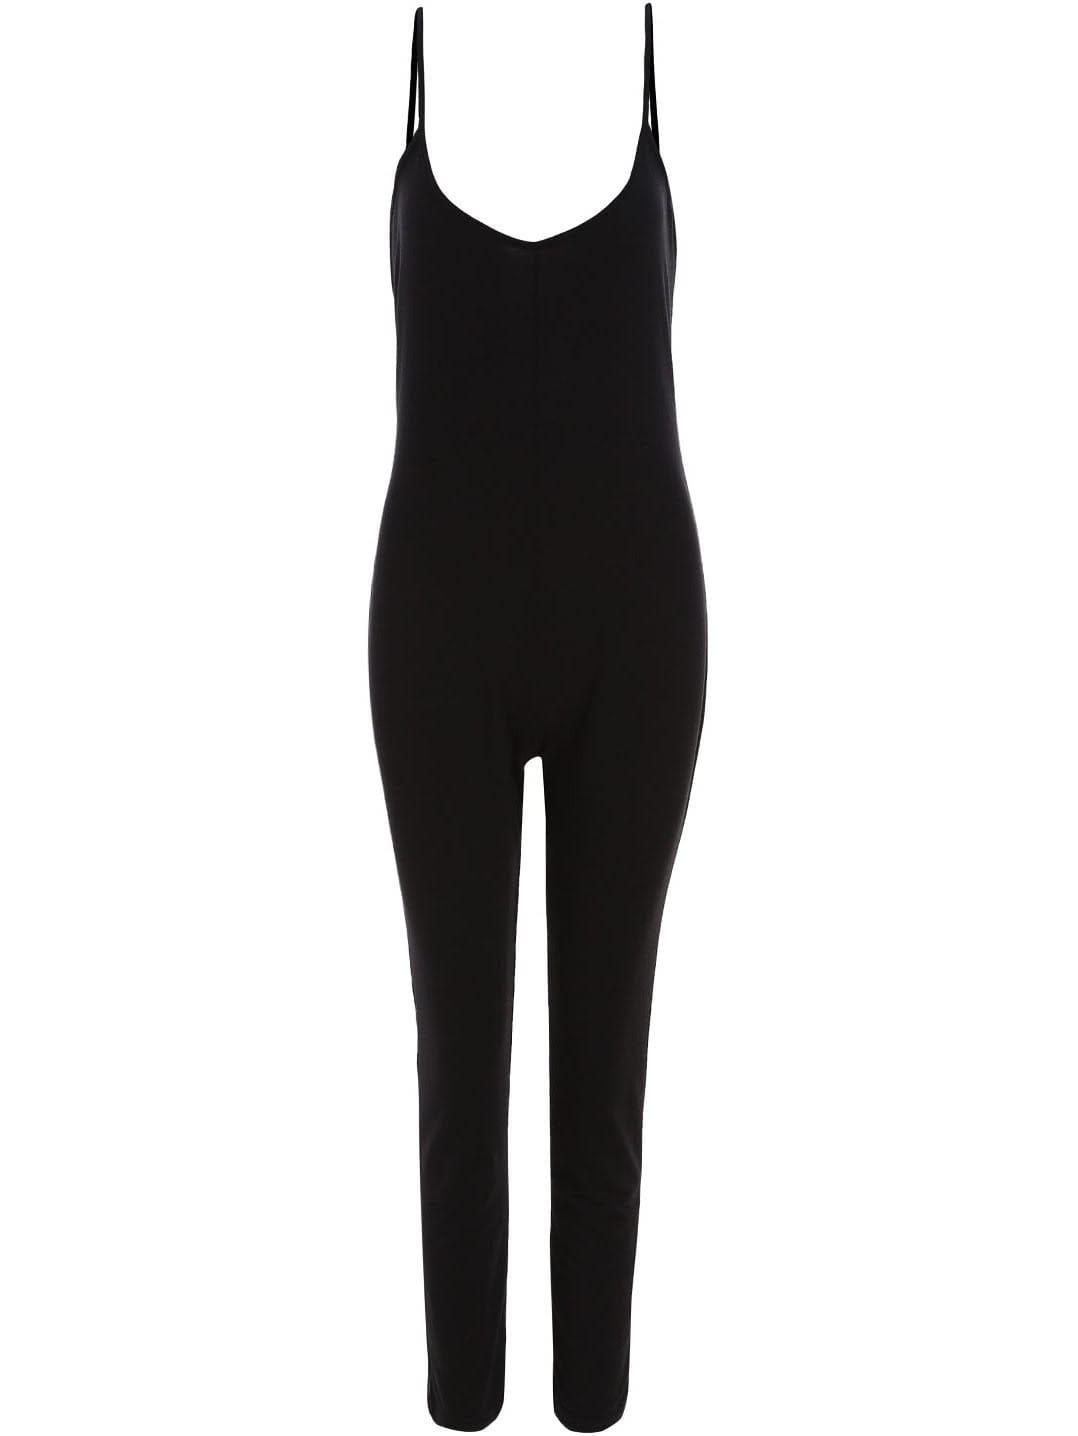 Black Spaghetti Strap Backless Slim Jumpsuit jumpsuit150529151